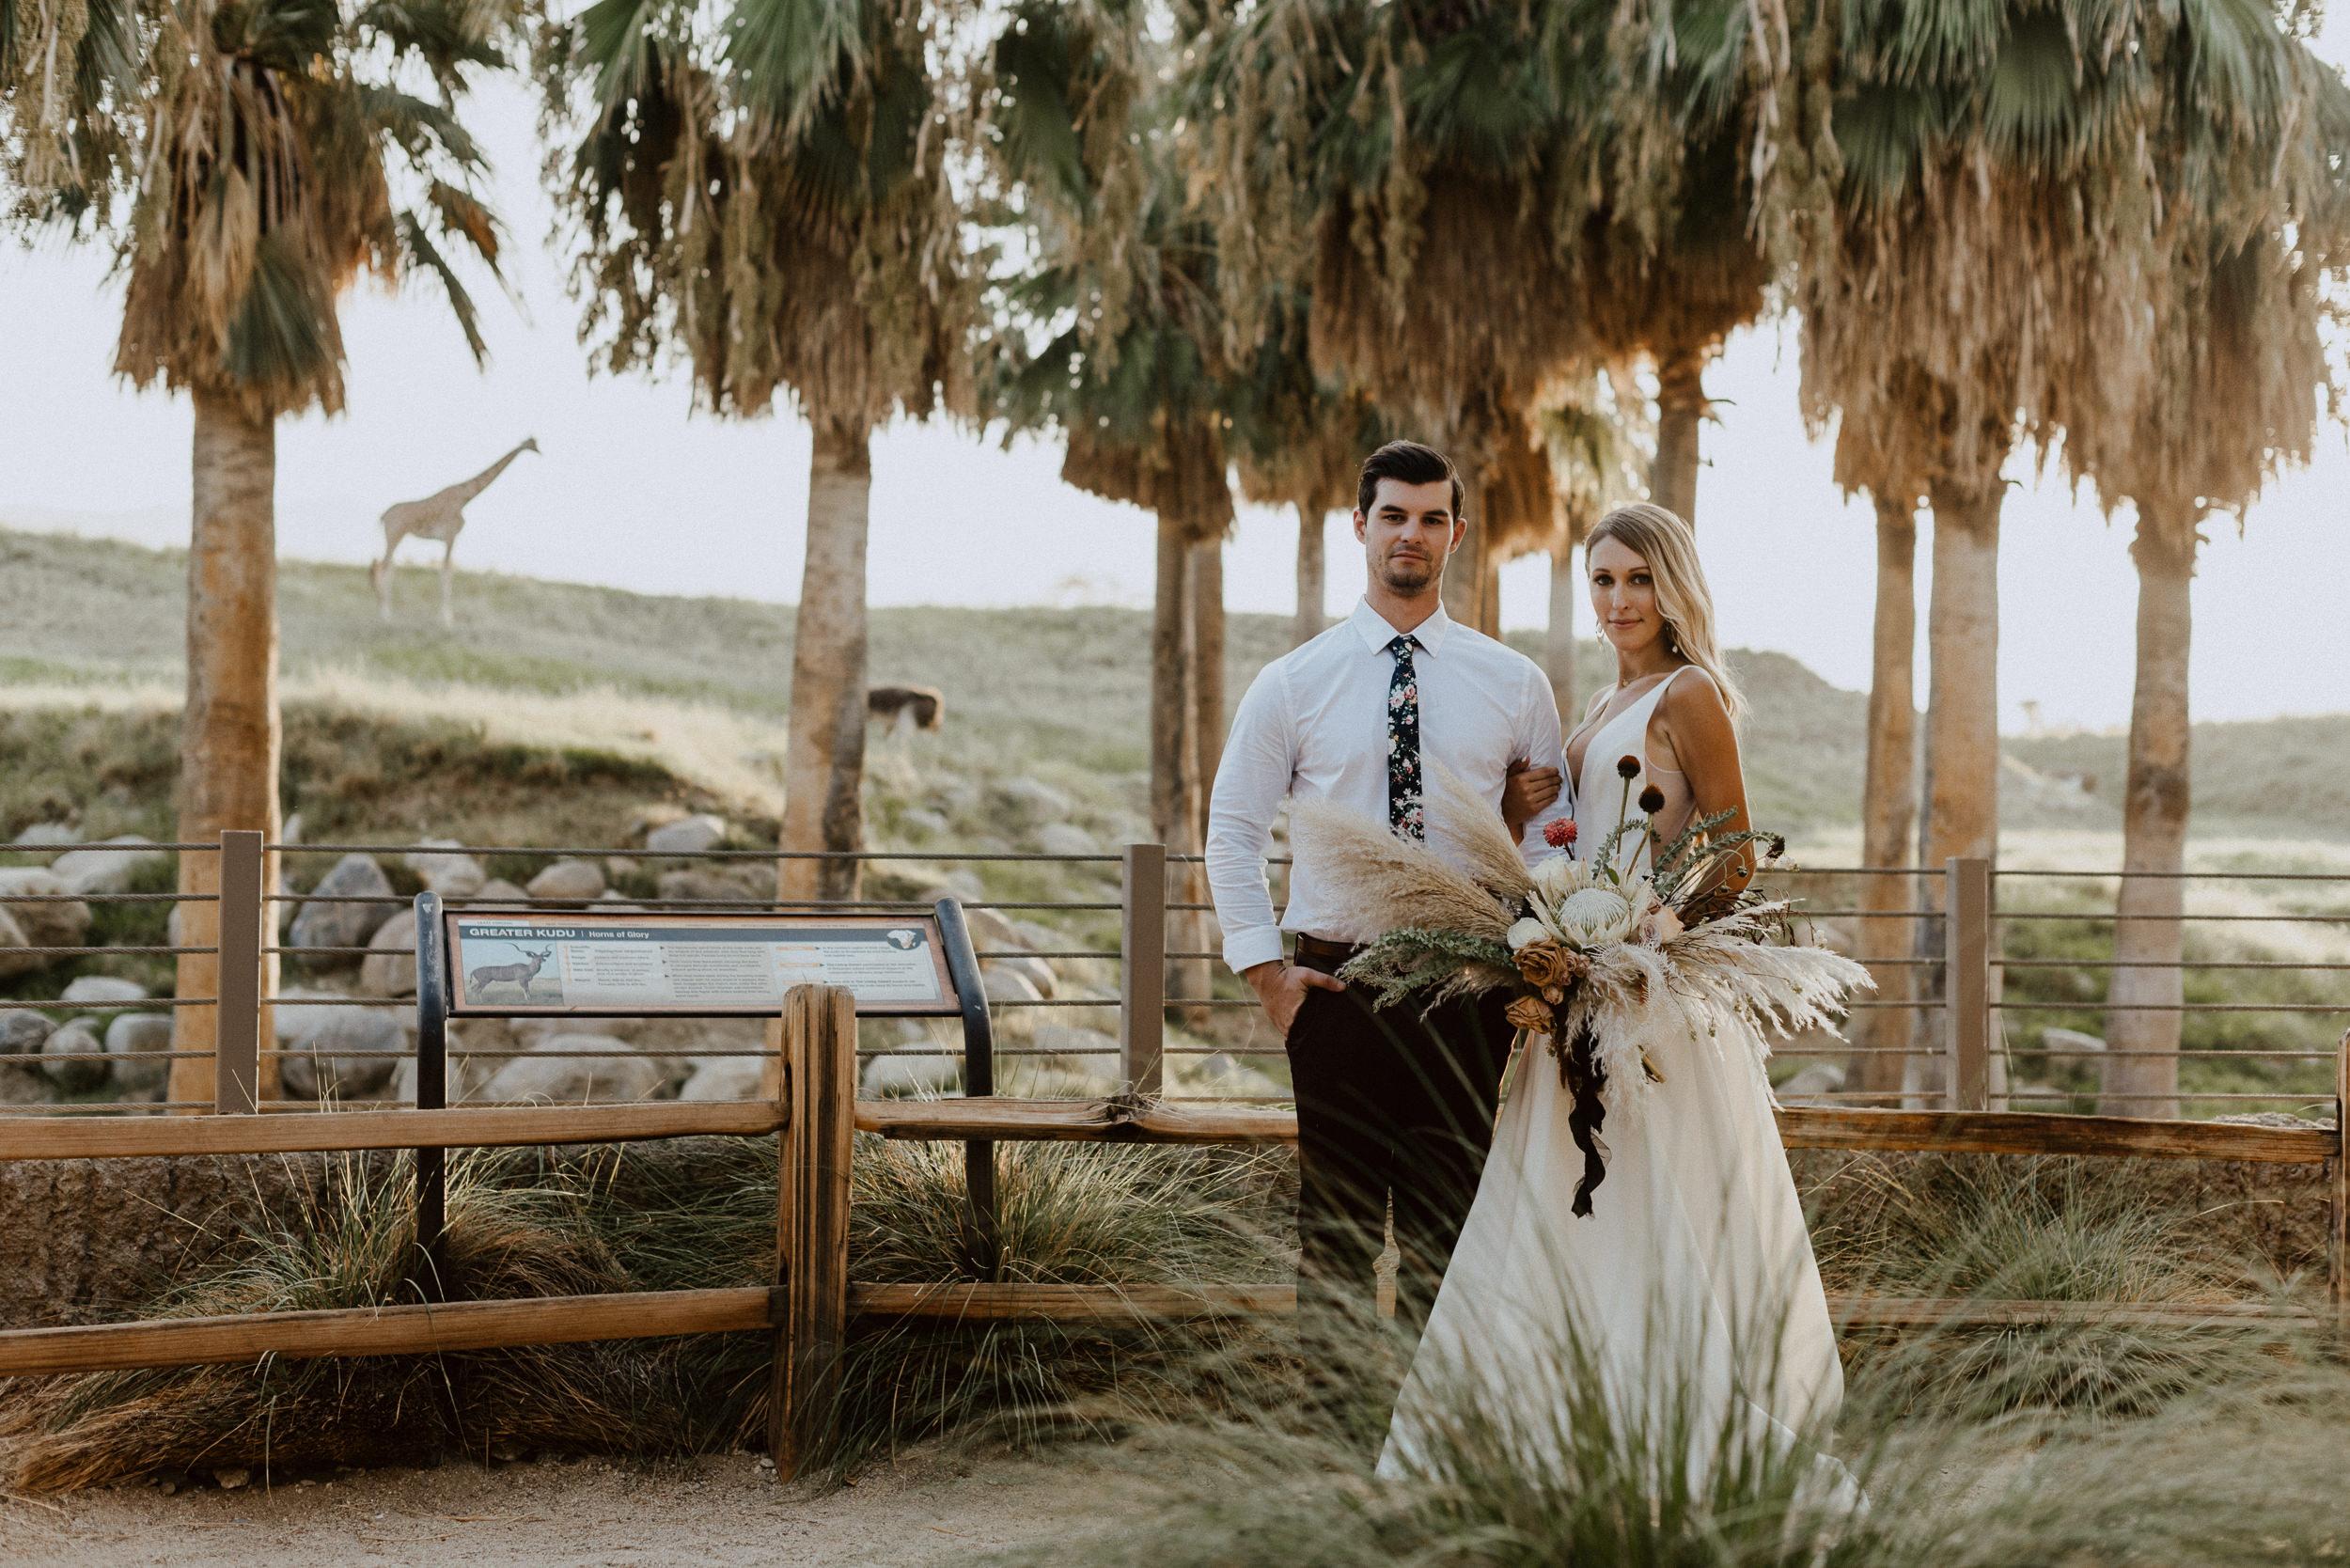 sChelsie + Chris - The Desert Shootout Wedding Romantics at The Living Desert-124.jpg